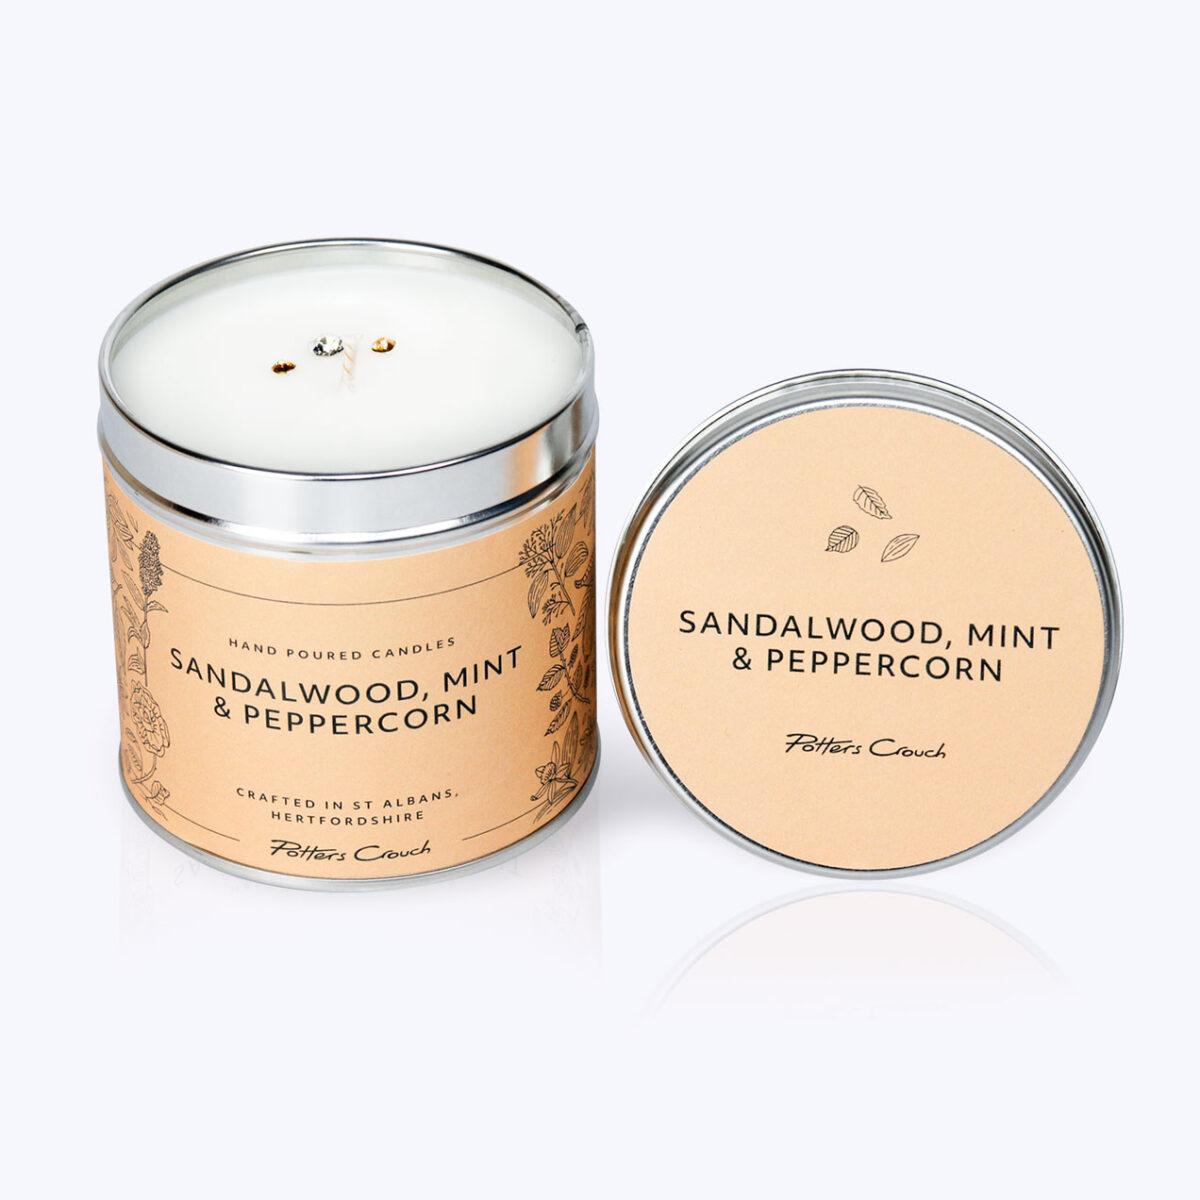 Sandalwood, Mint & Peppercorn Wellness Candle - For Mental Strength